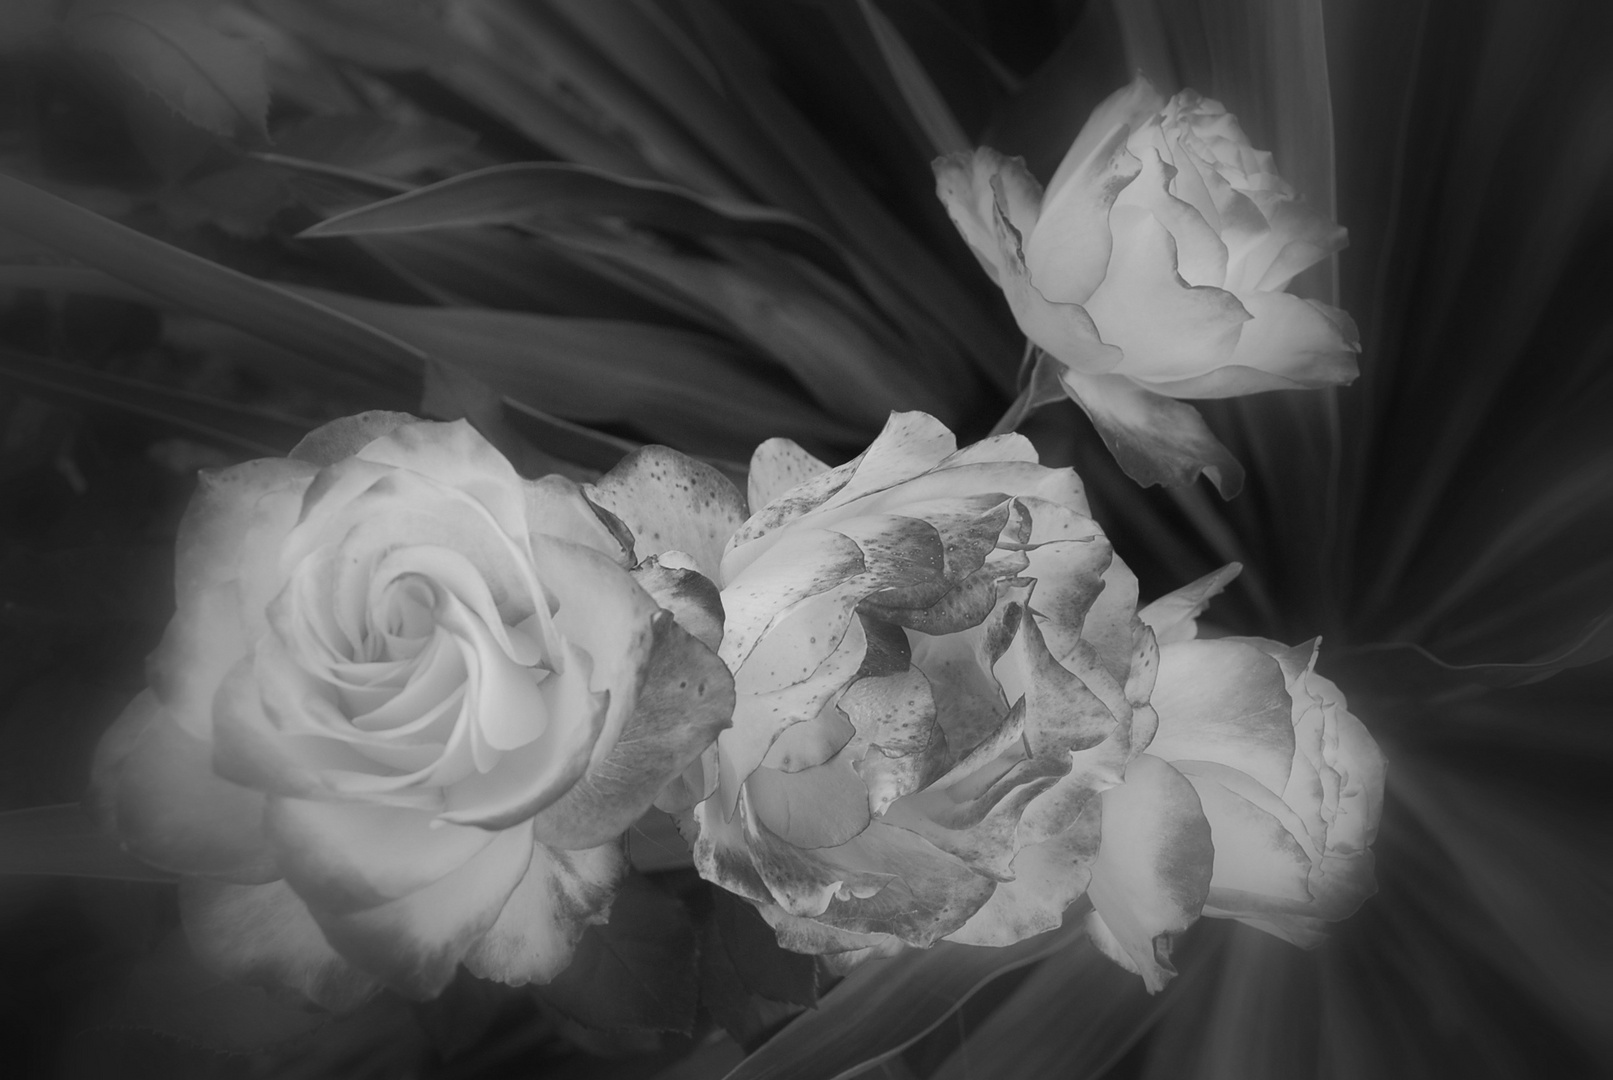 Roses Sissy